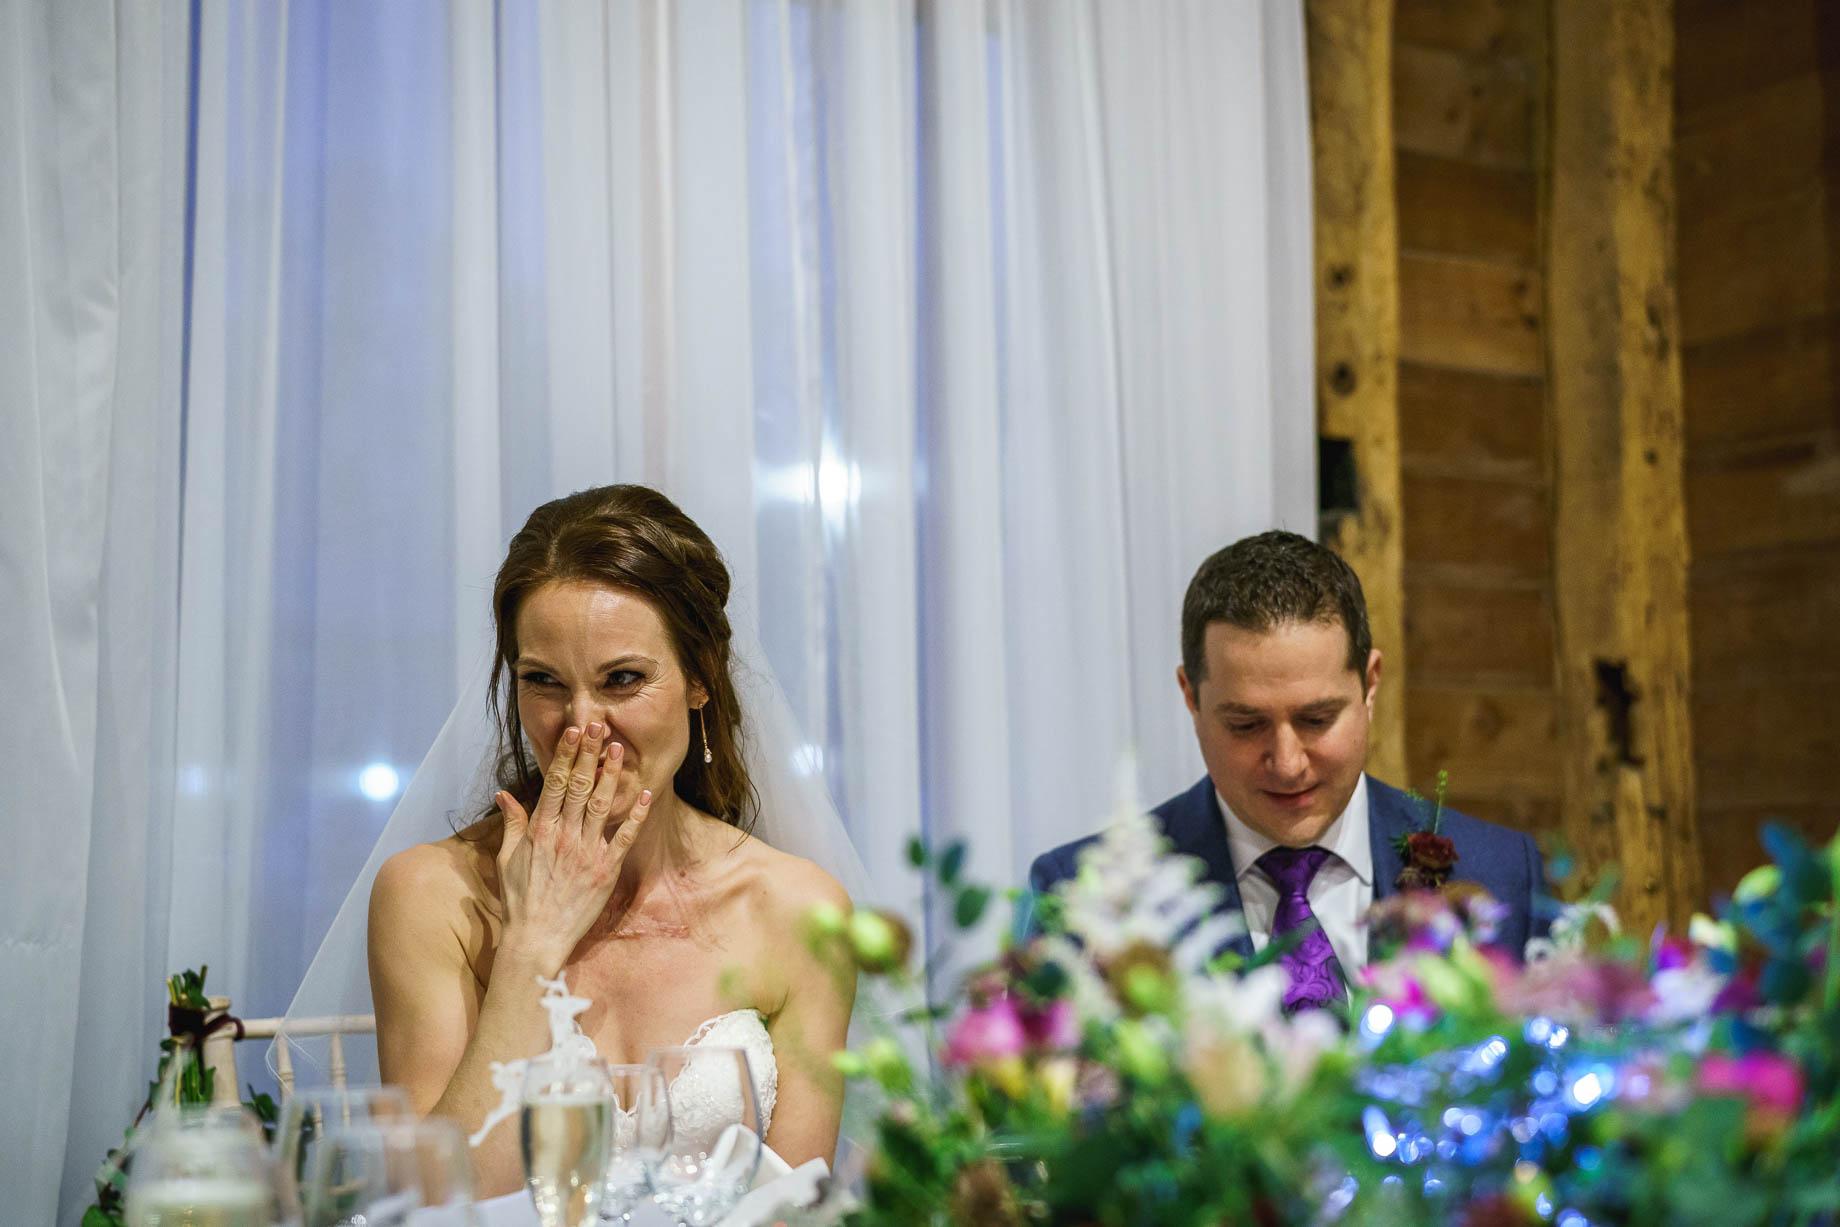 Tewin Bury Farm wedding photography - Liz + Jonny